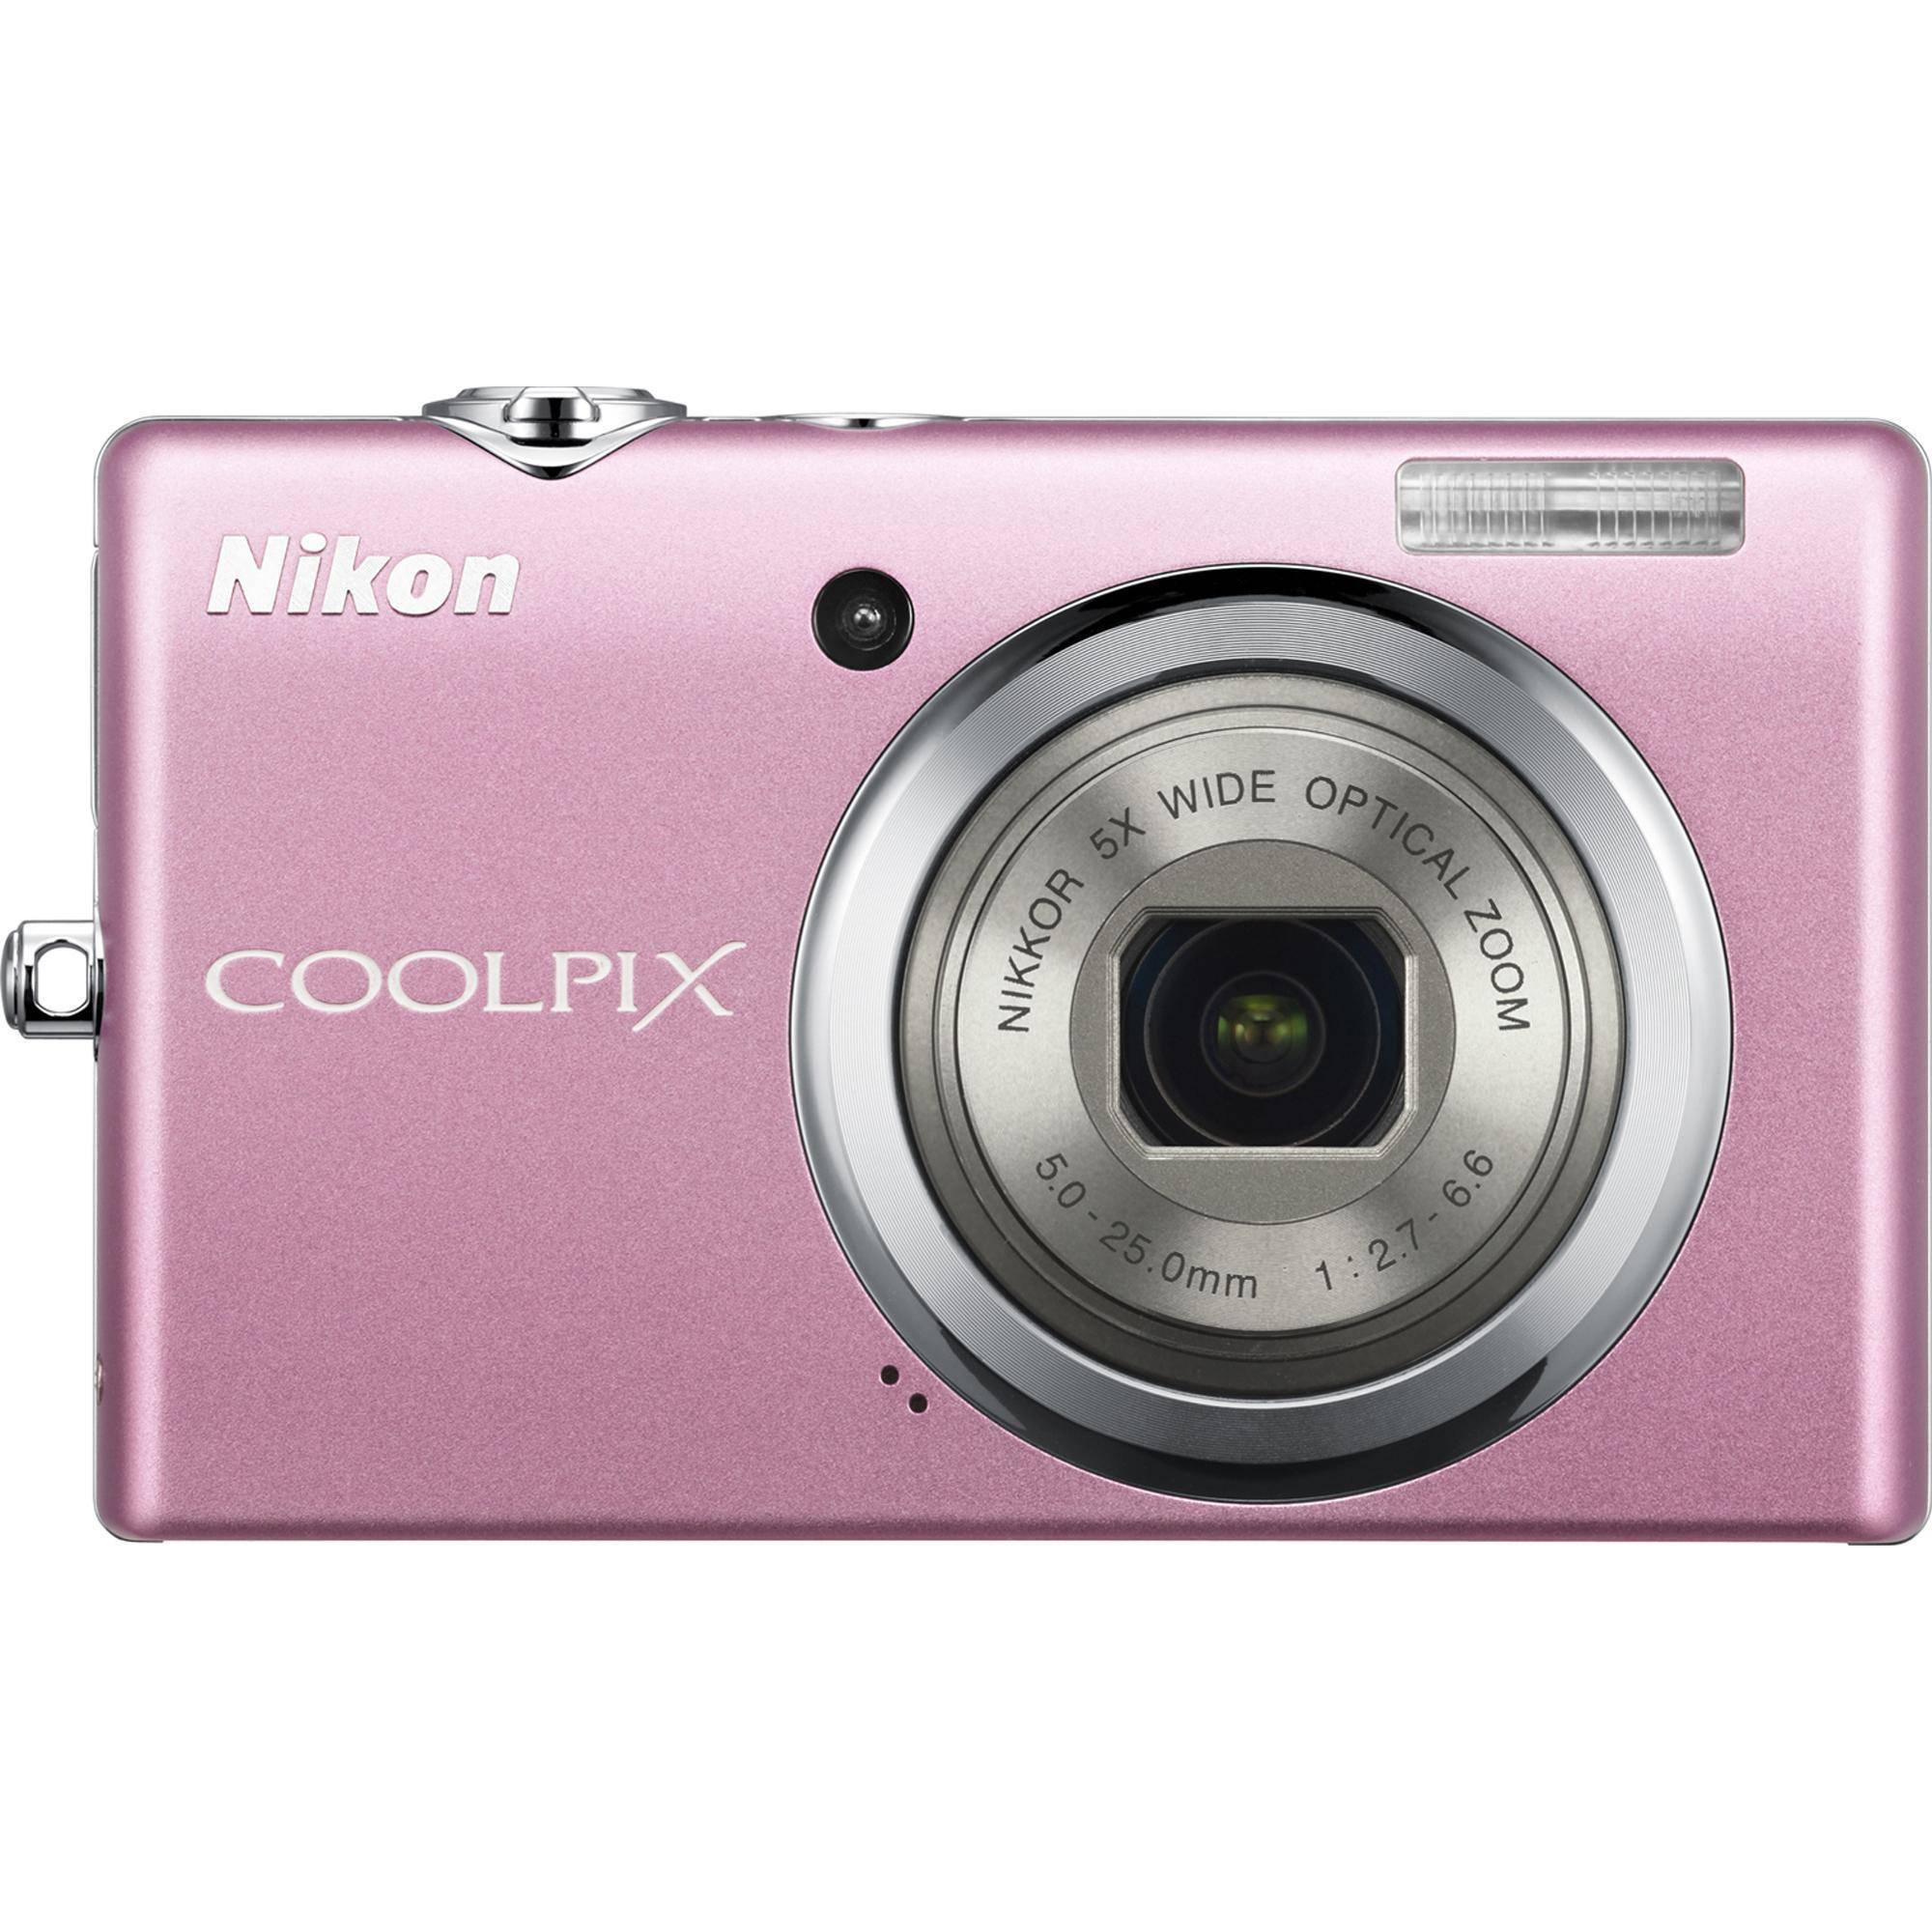 nikon coolpix s570 digital camera pink 26181 b h photo video rh bhphotovideo com VisionTek 5570 Drivers 5570 Phone